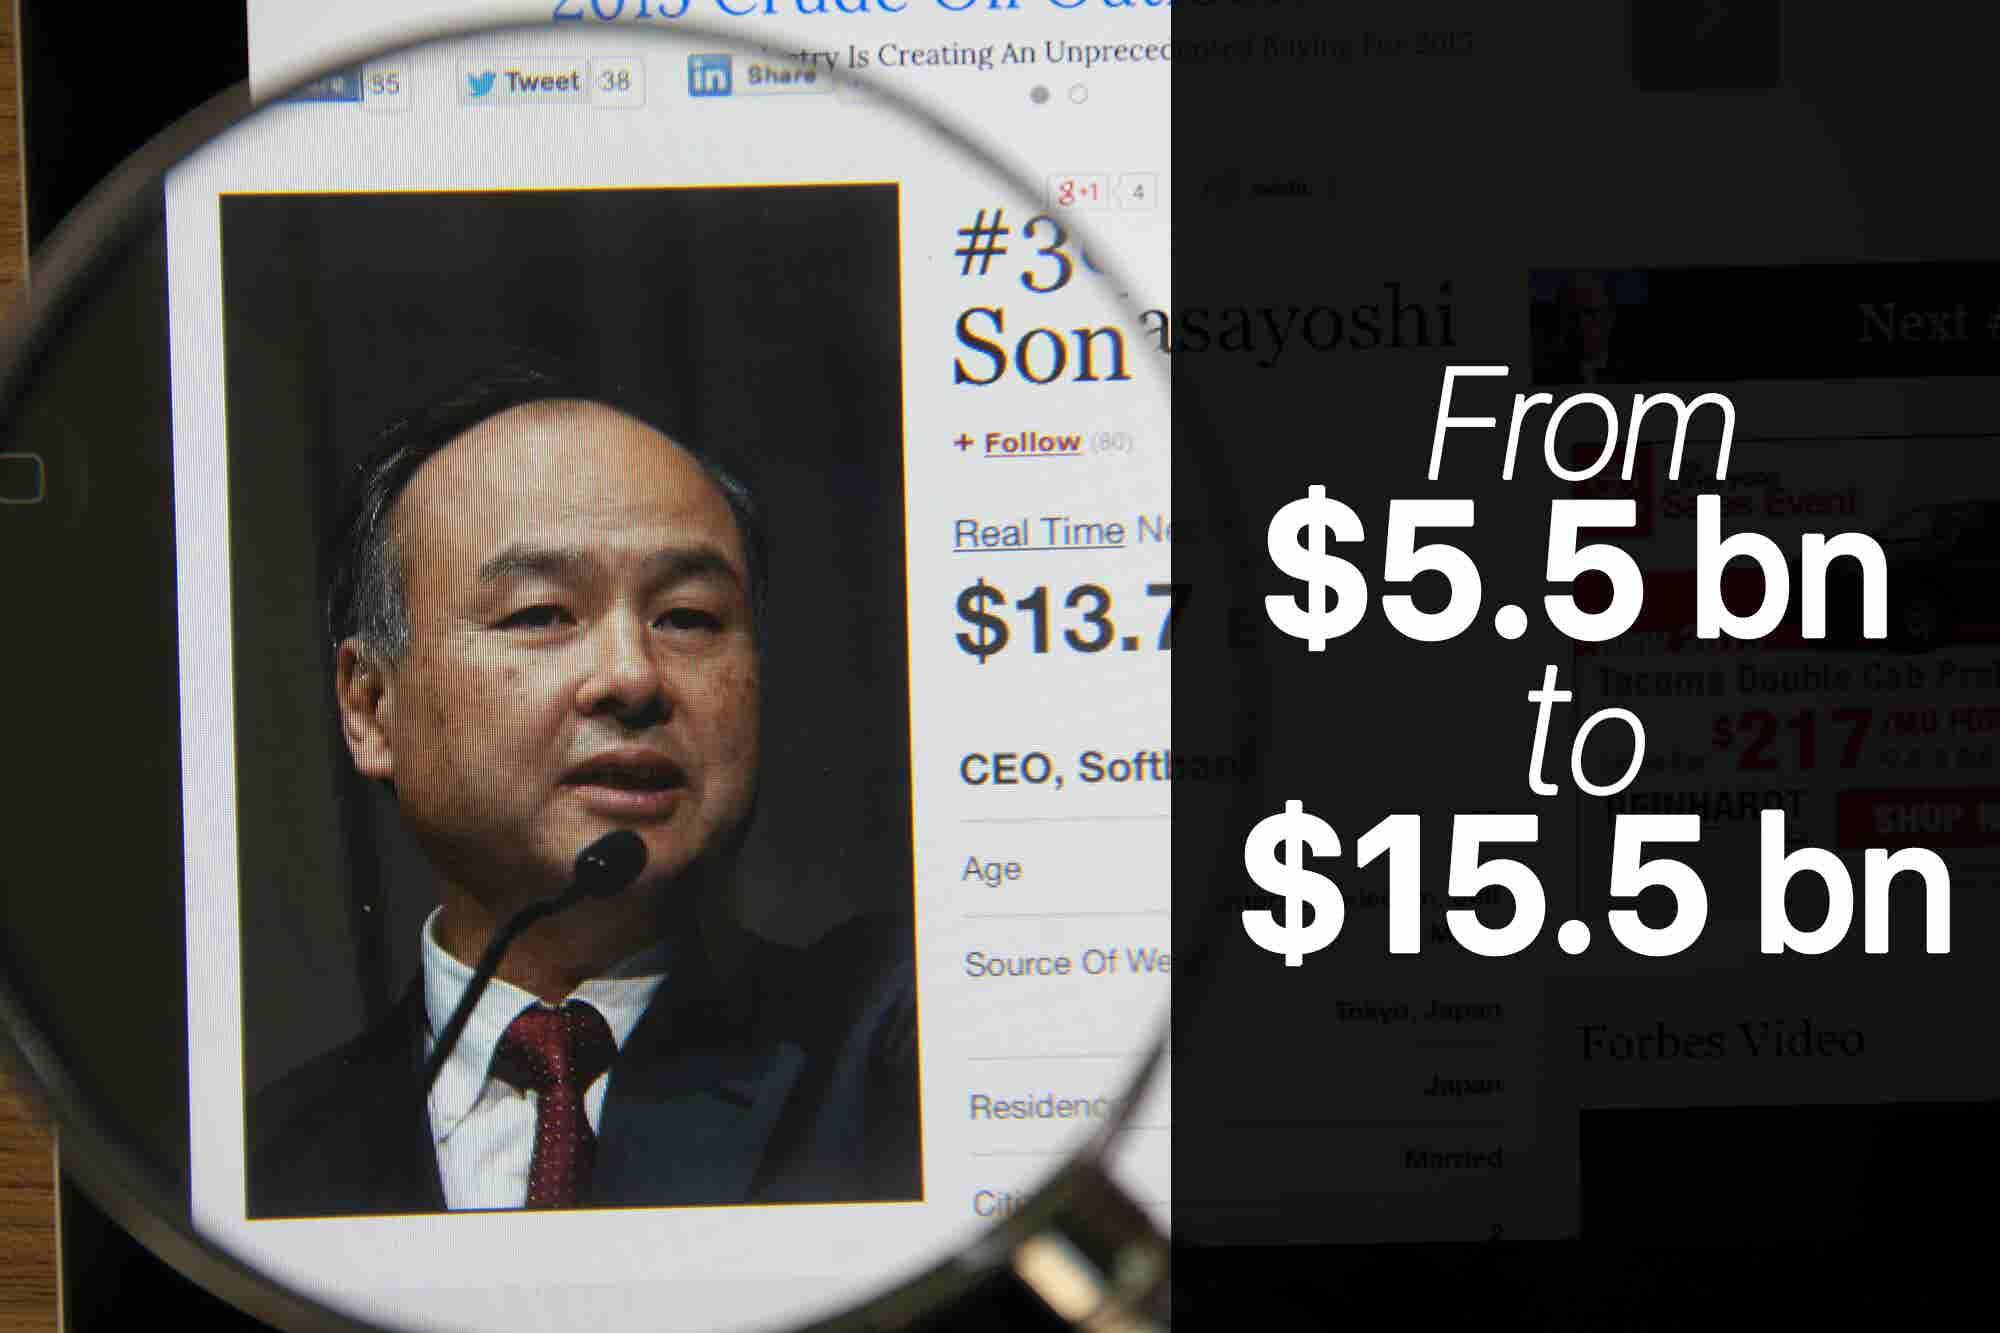 Friday Flashback: How Softbank's Founder Turned $5.5 billion to $15.5 billion Within a Day